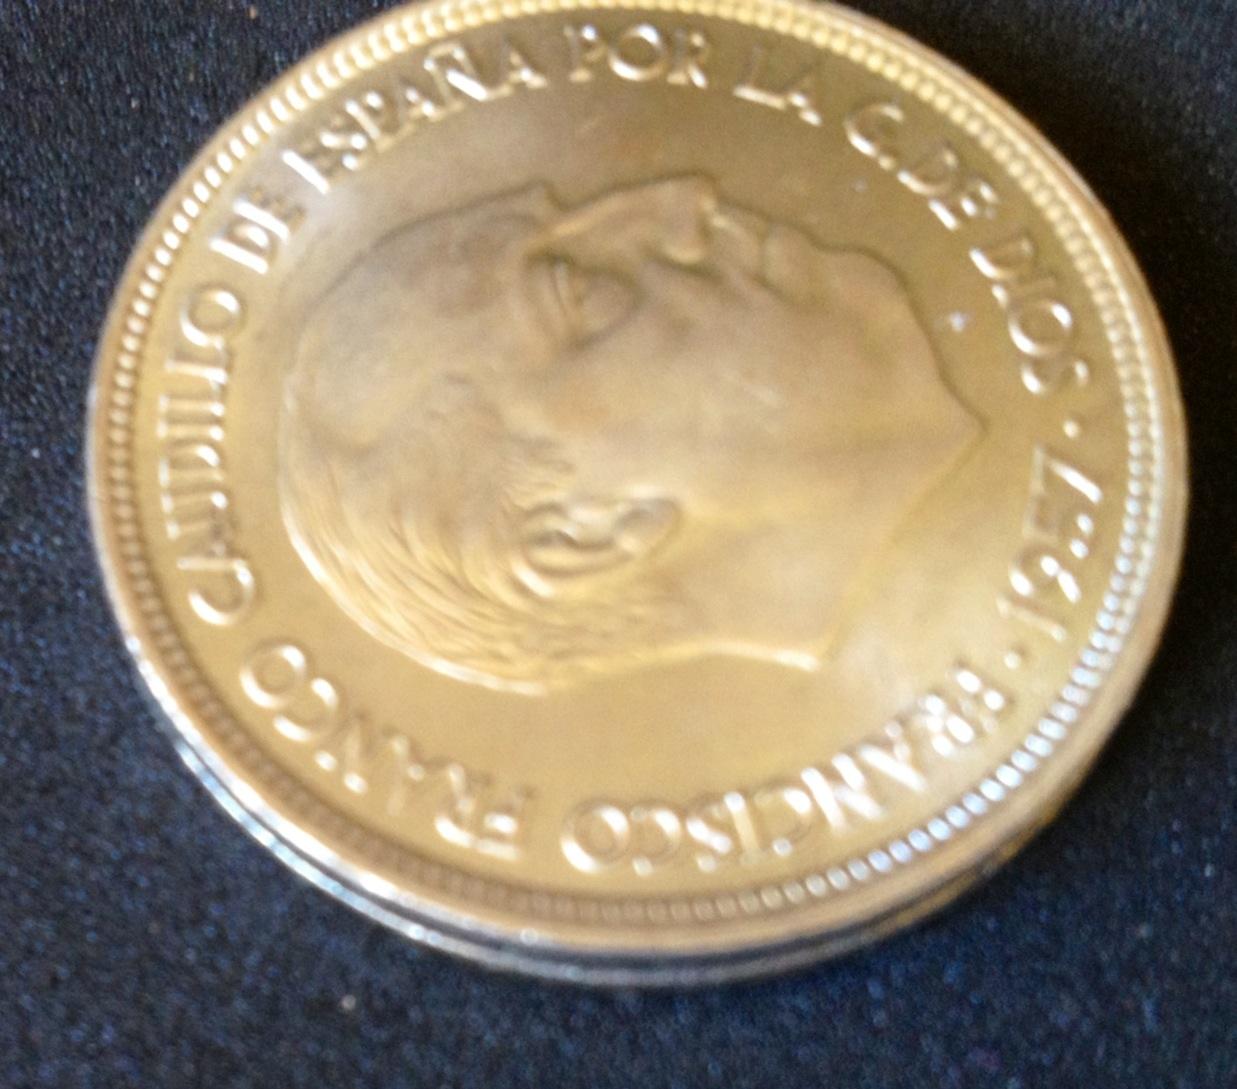 50 pesetas 1957- Estado Español-Adivinanza Image